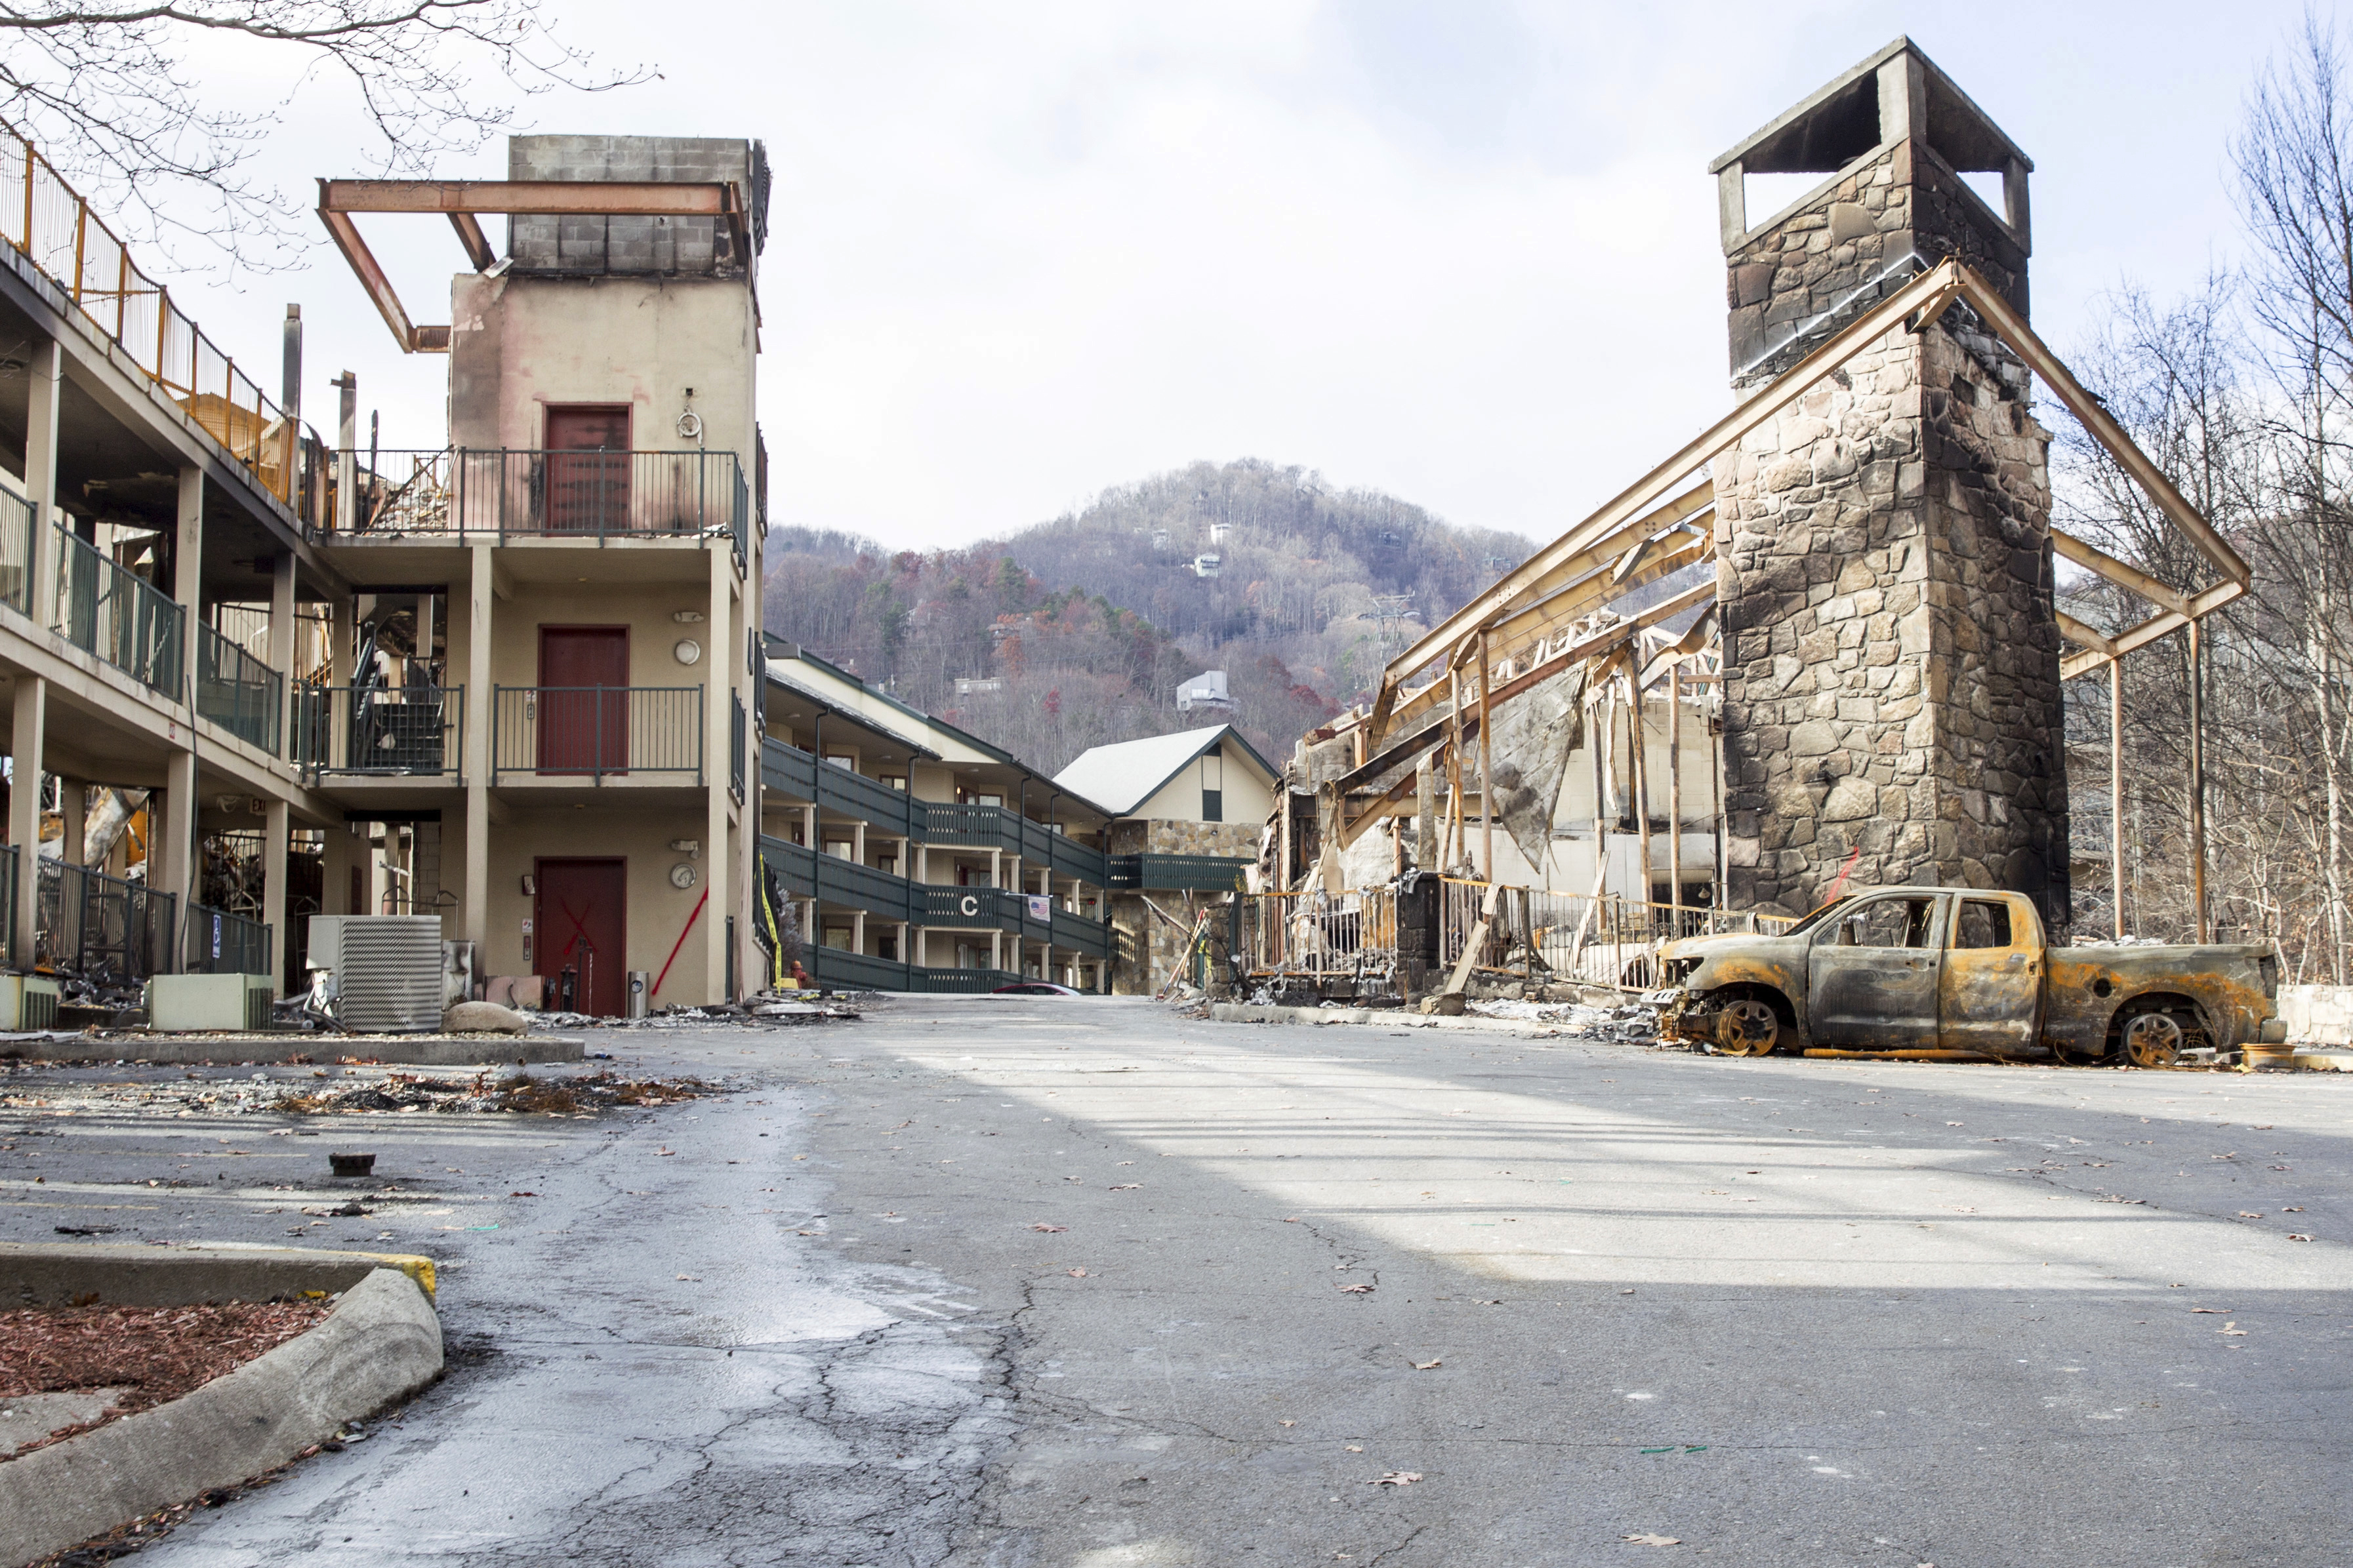 Motel  Gatlinburg Fire